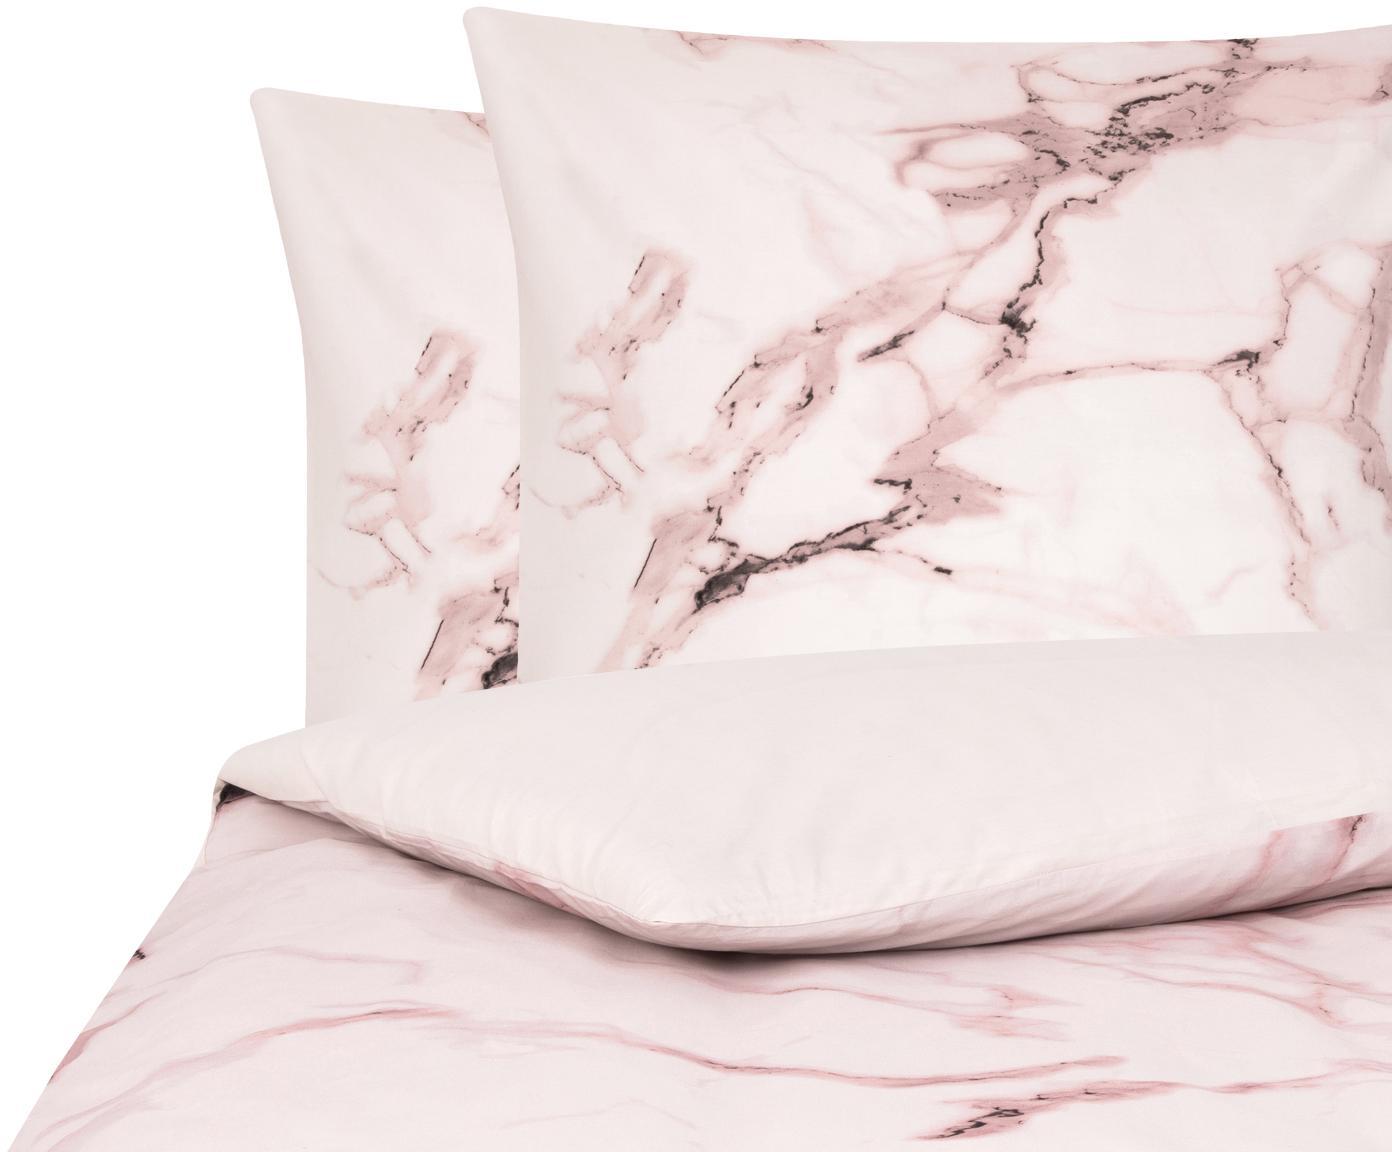 Baumwollperkal-Bettwäsche Malin mit Marmor-Muster, Webart: Perkal Fadendichte 200 TC, Marmormuster, Rosa, 240 x 220 cm + 2 Kissen 80 x 80 cm